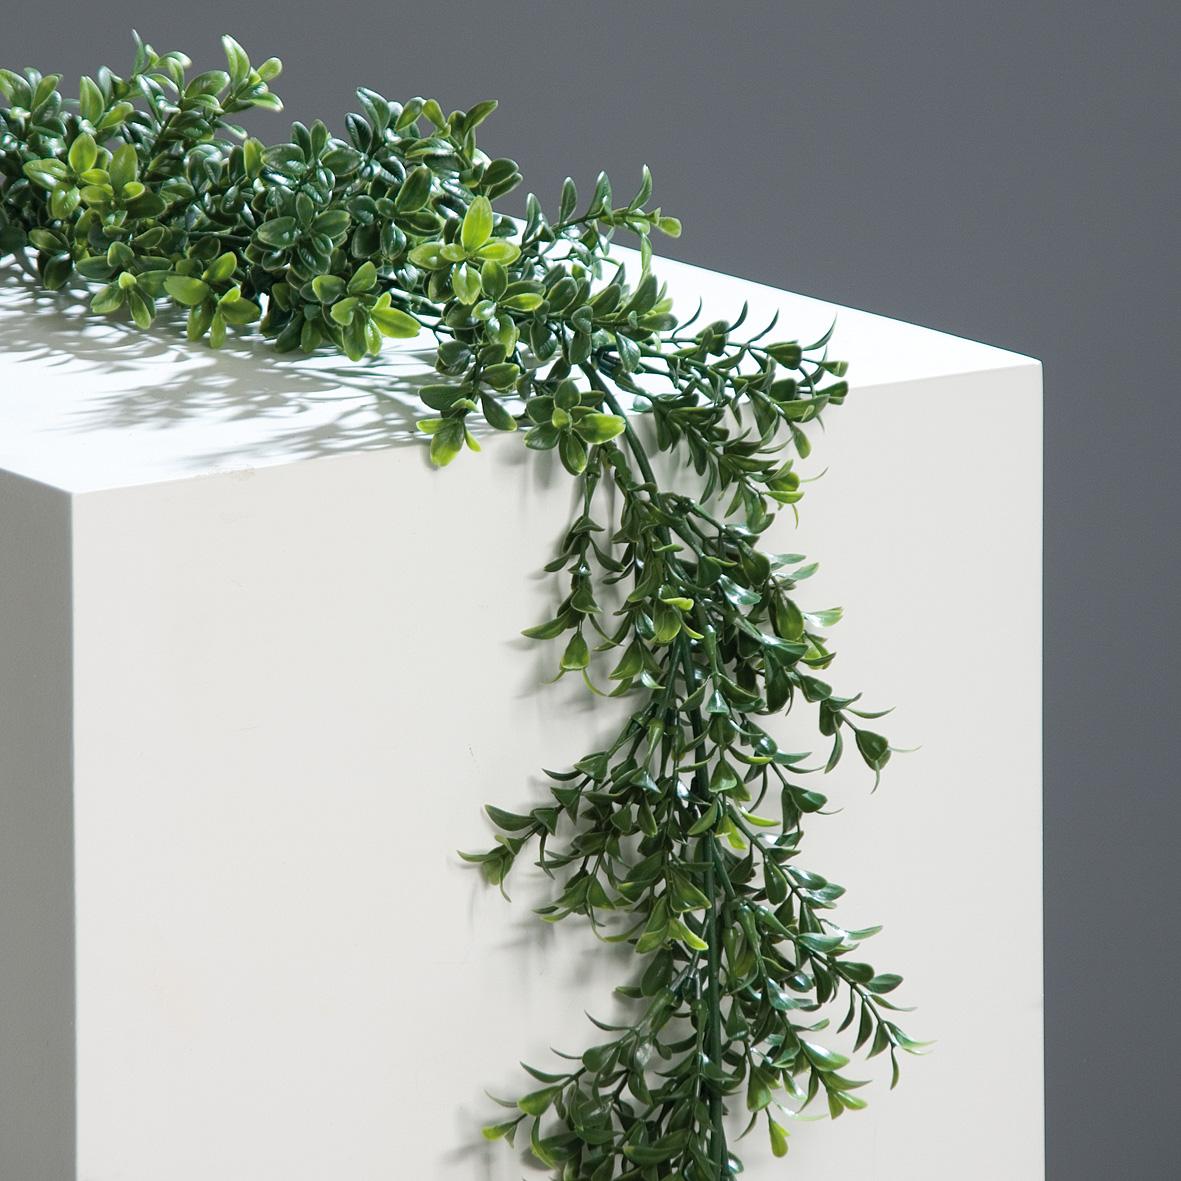 Buchsgirlande grün 180cm lang Kunstpflanze Heimdeko